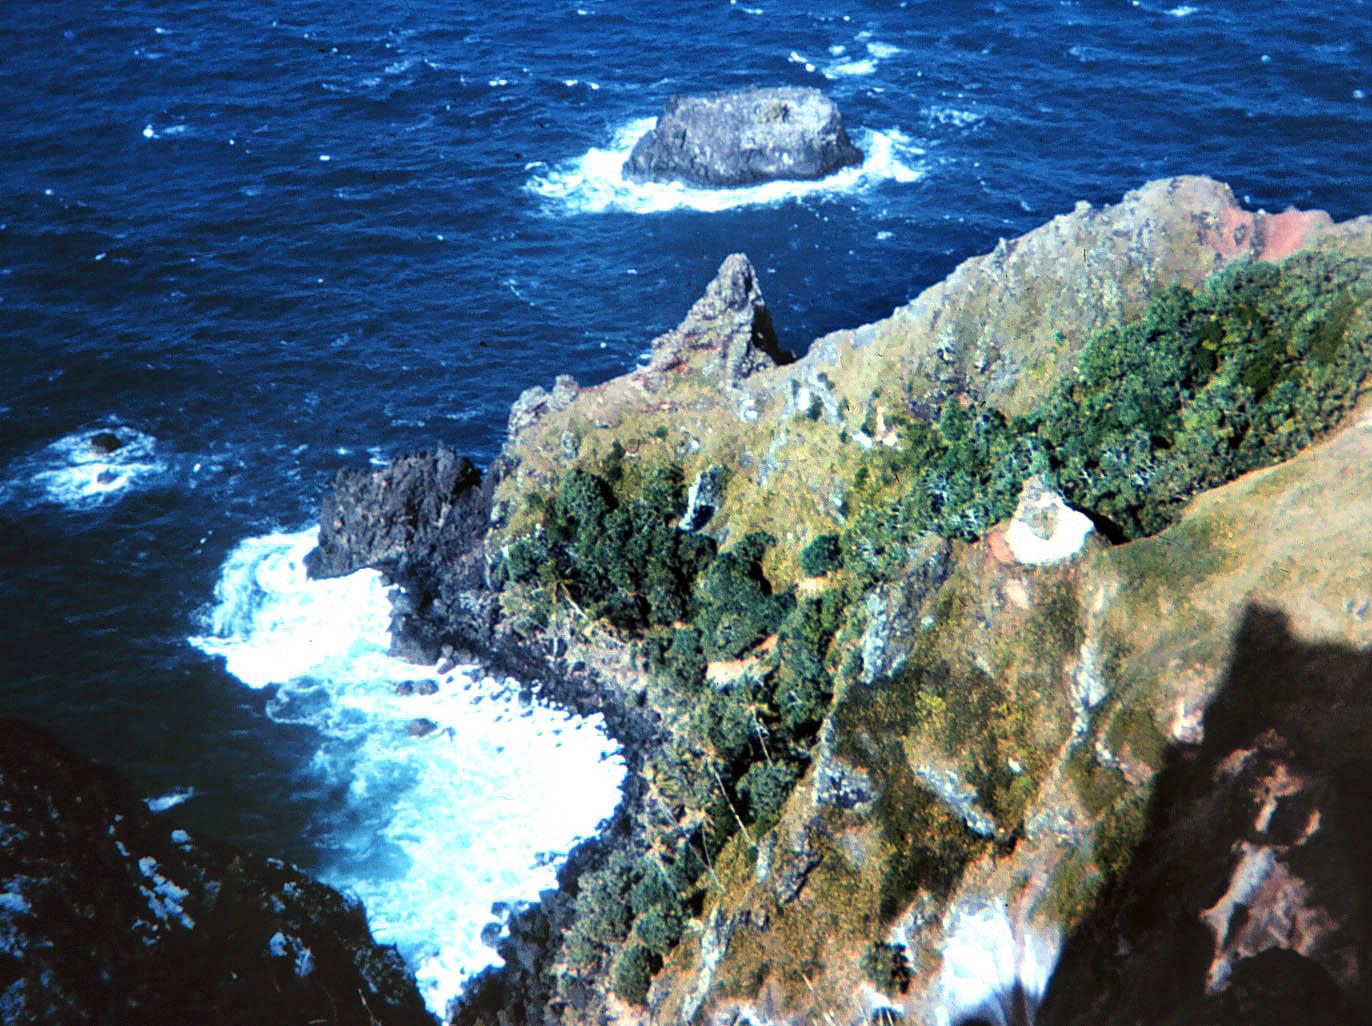 Photo Credit https://www.wikiwand.com/en/Pitcairn_Islands